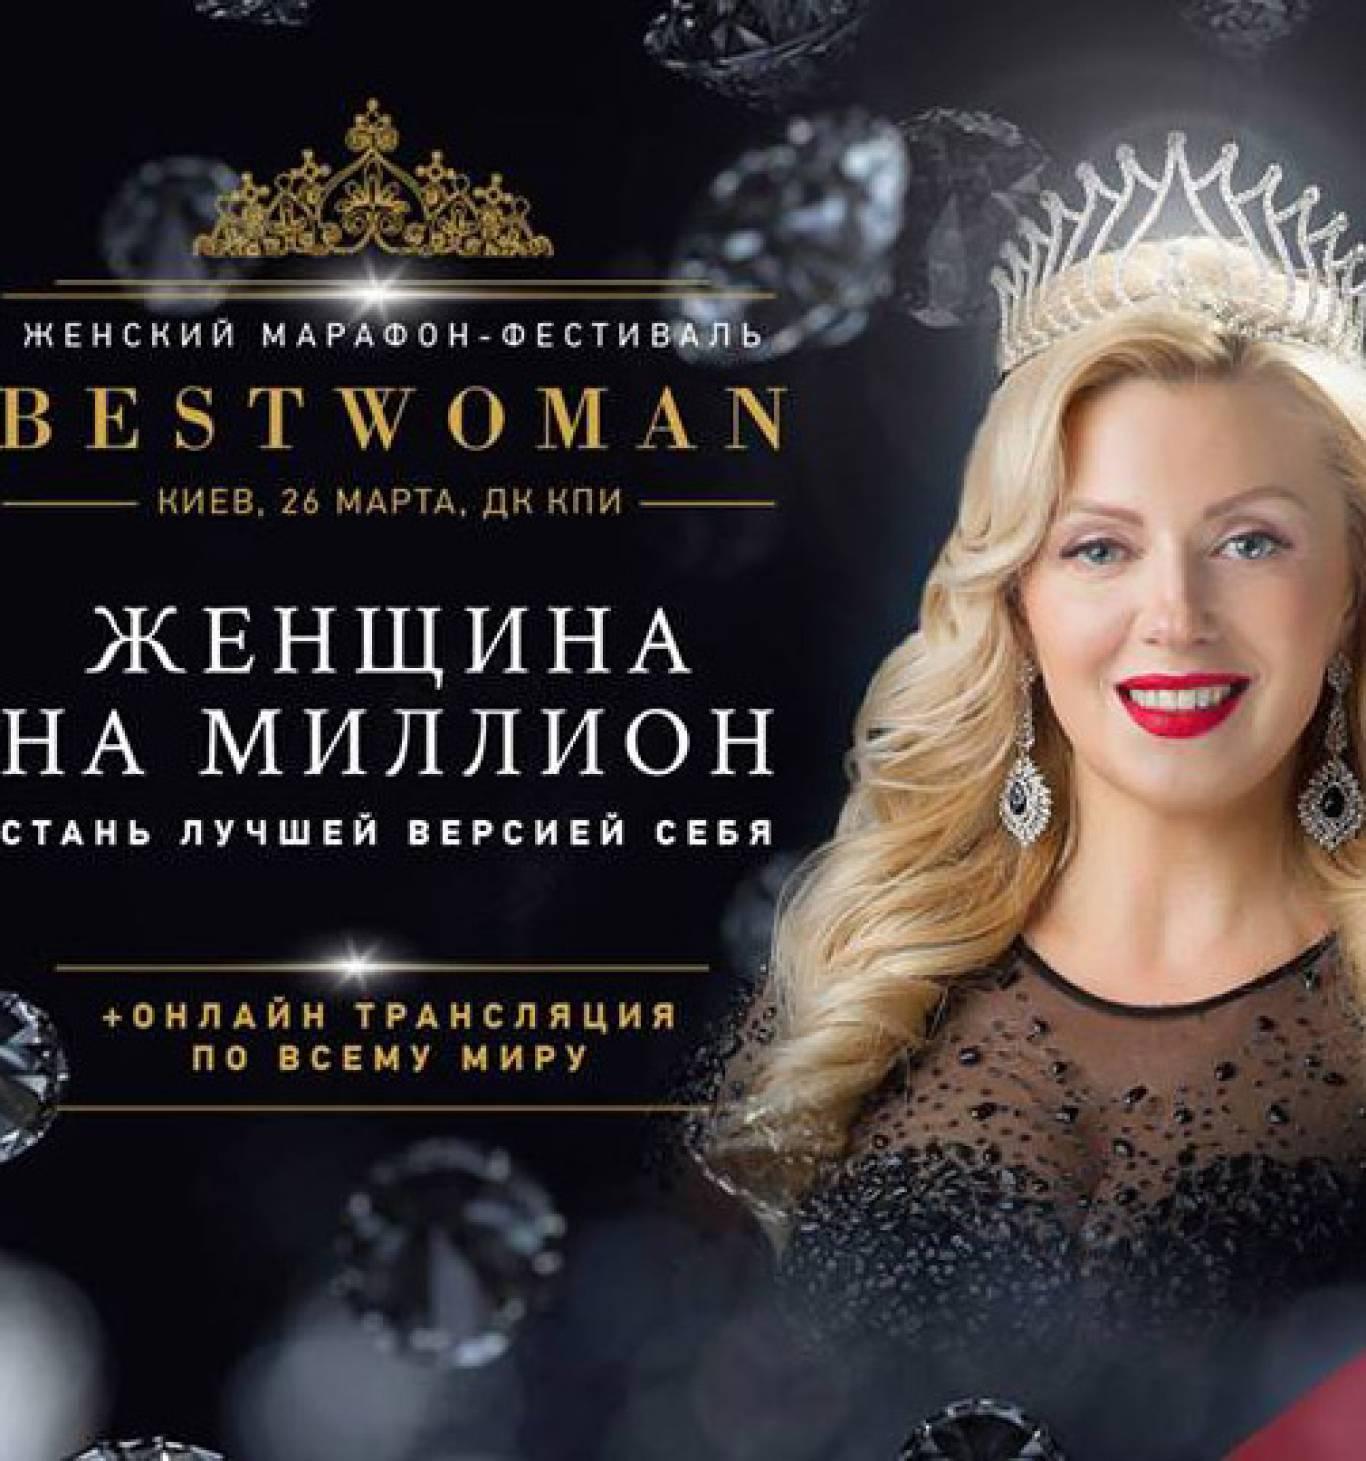 ФЕСТИВАЛЬ Best Woman